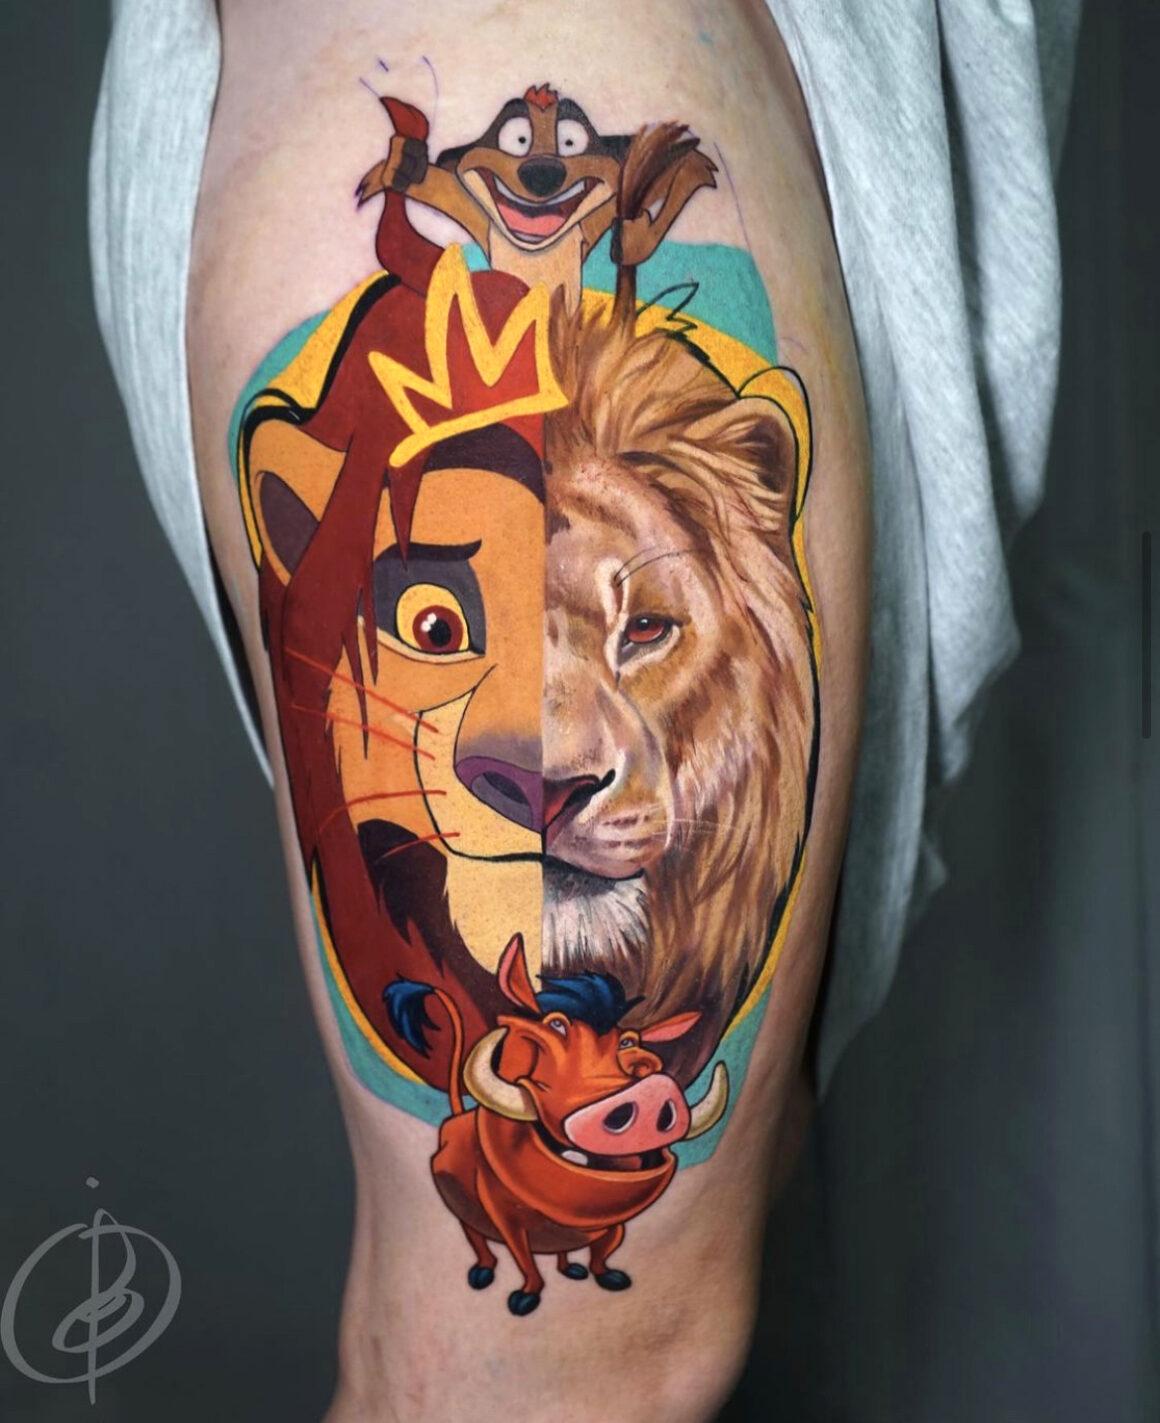 Daria Pirojenko, NBK Tattoo Collective, Moscow, Russia